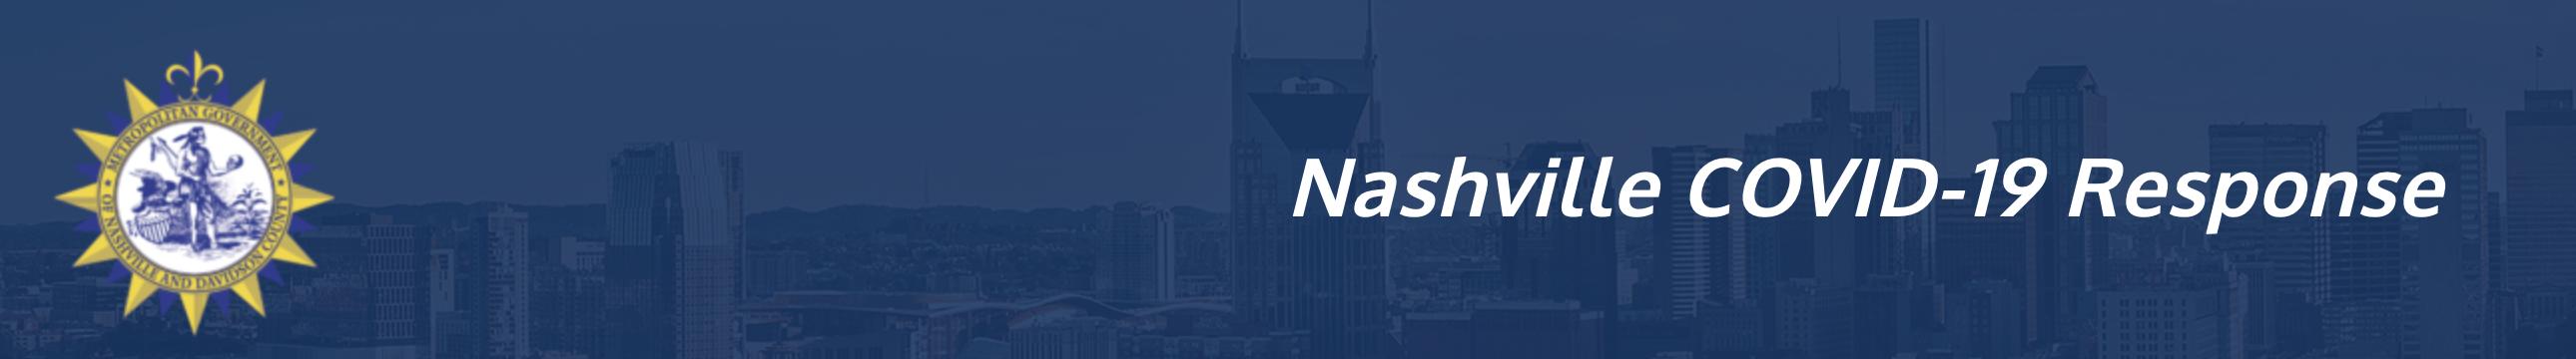 Nashville COVID-19 Response